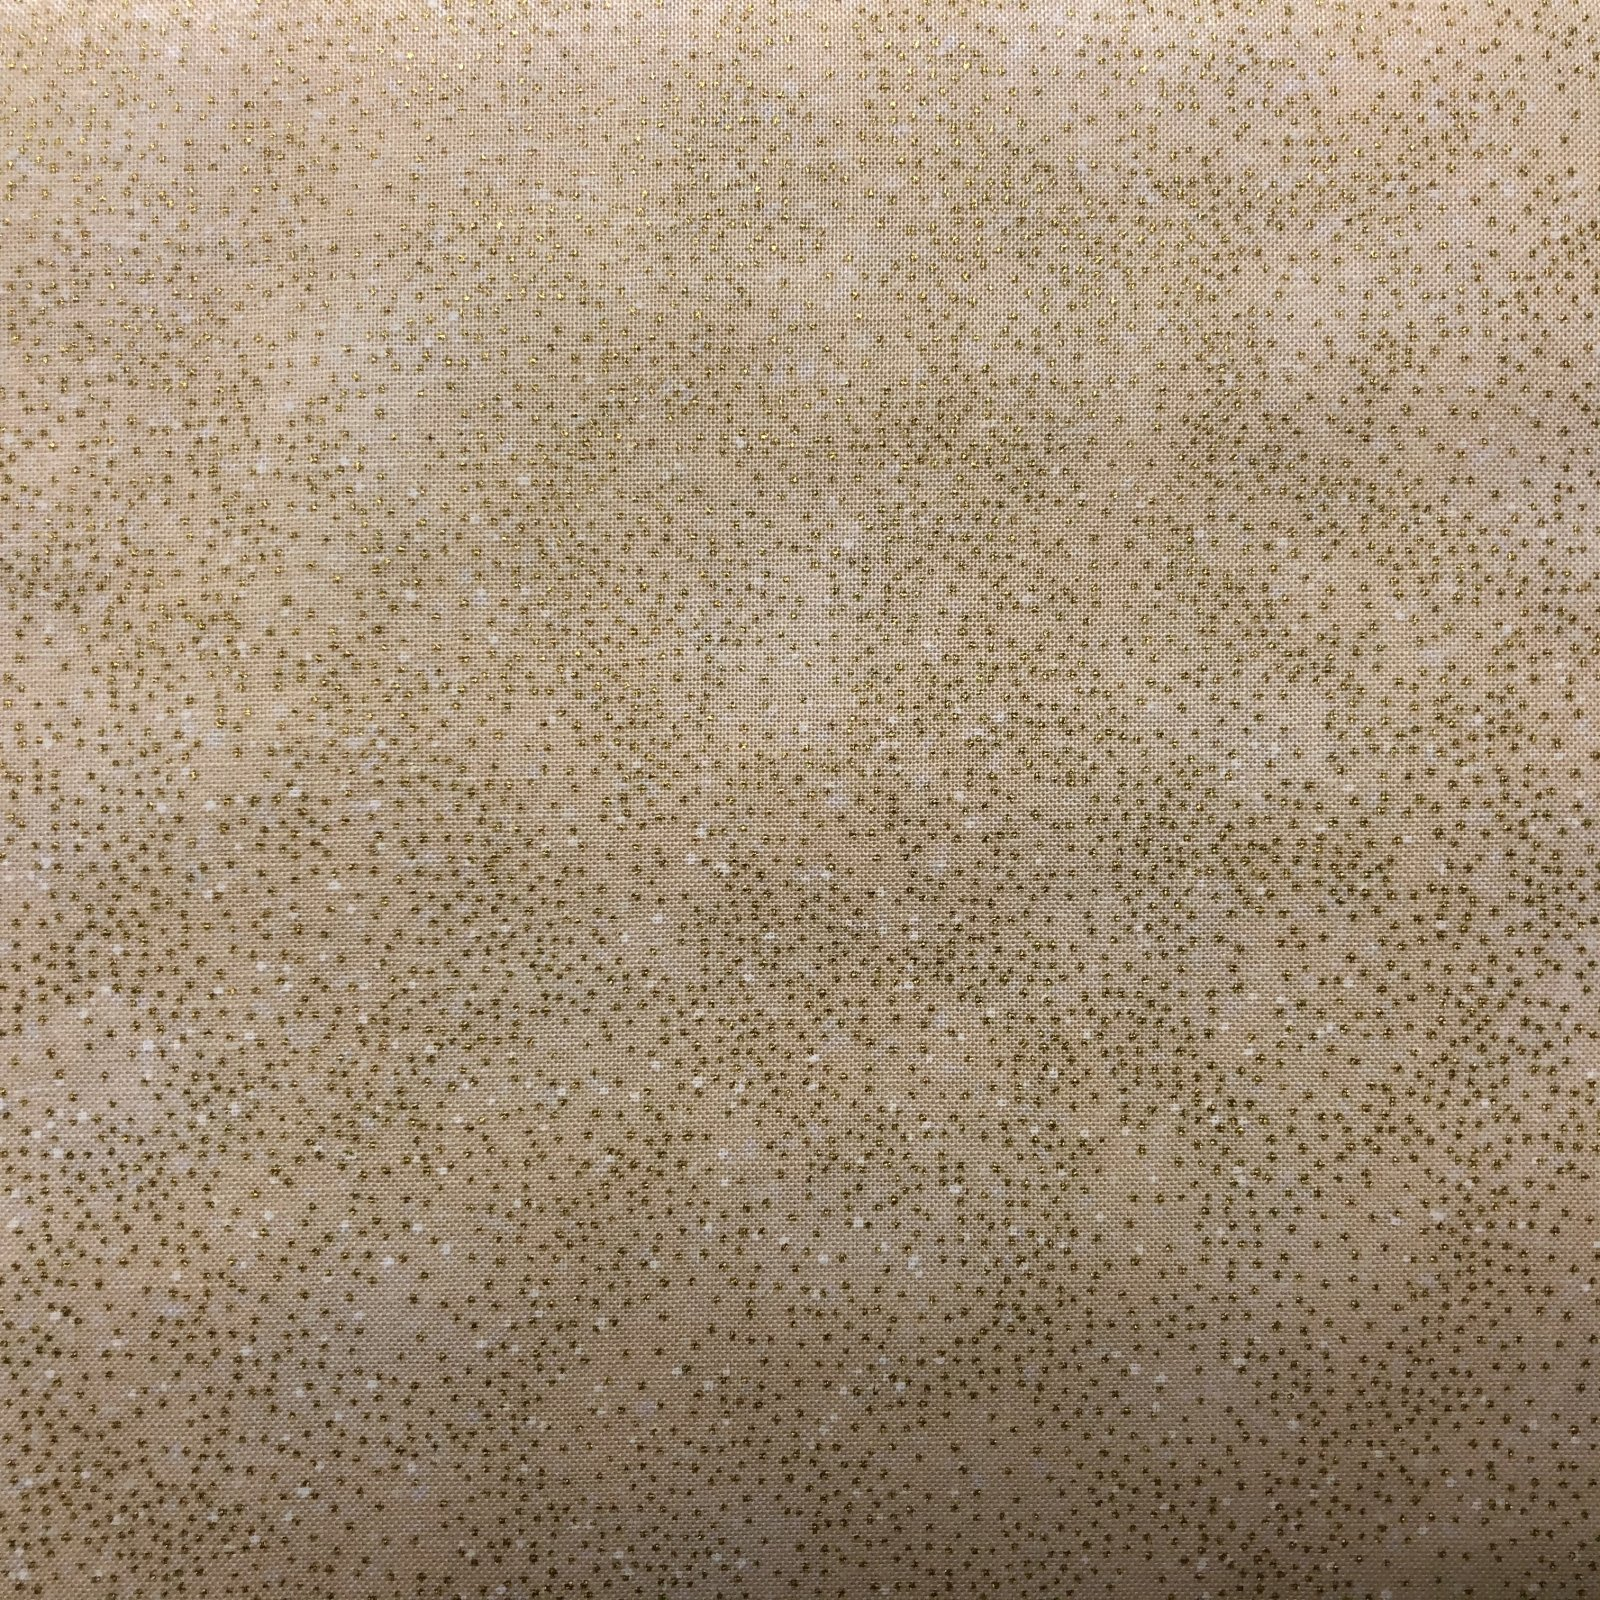 Brilliant Blender Ivory/Gold